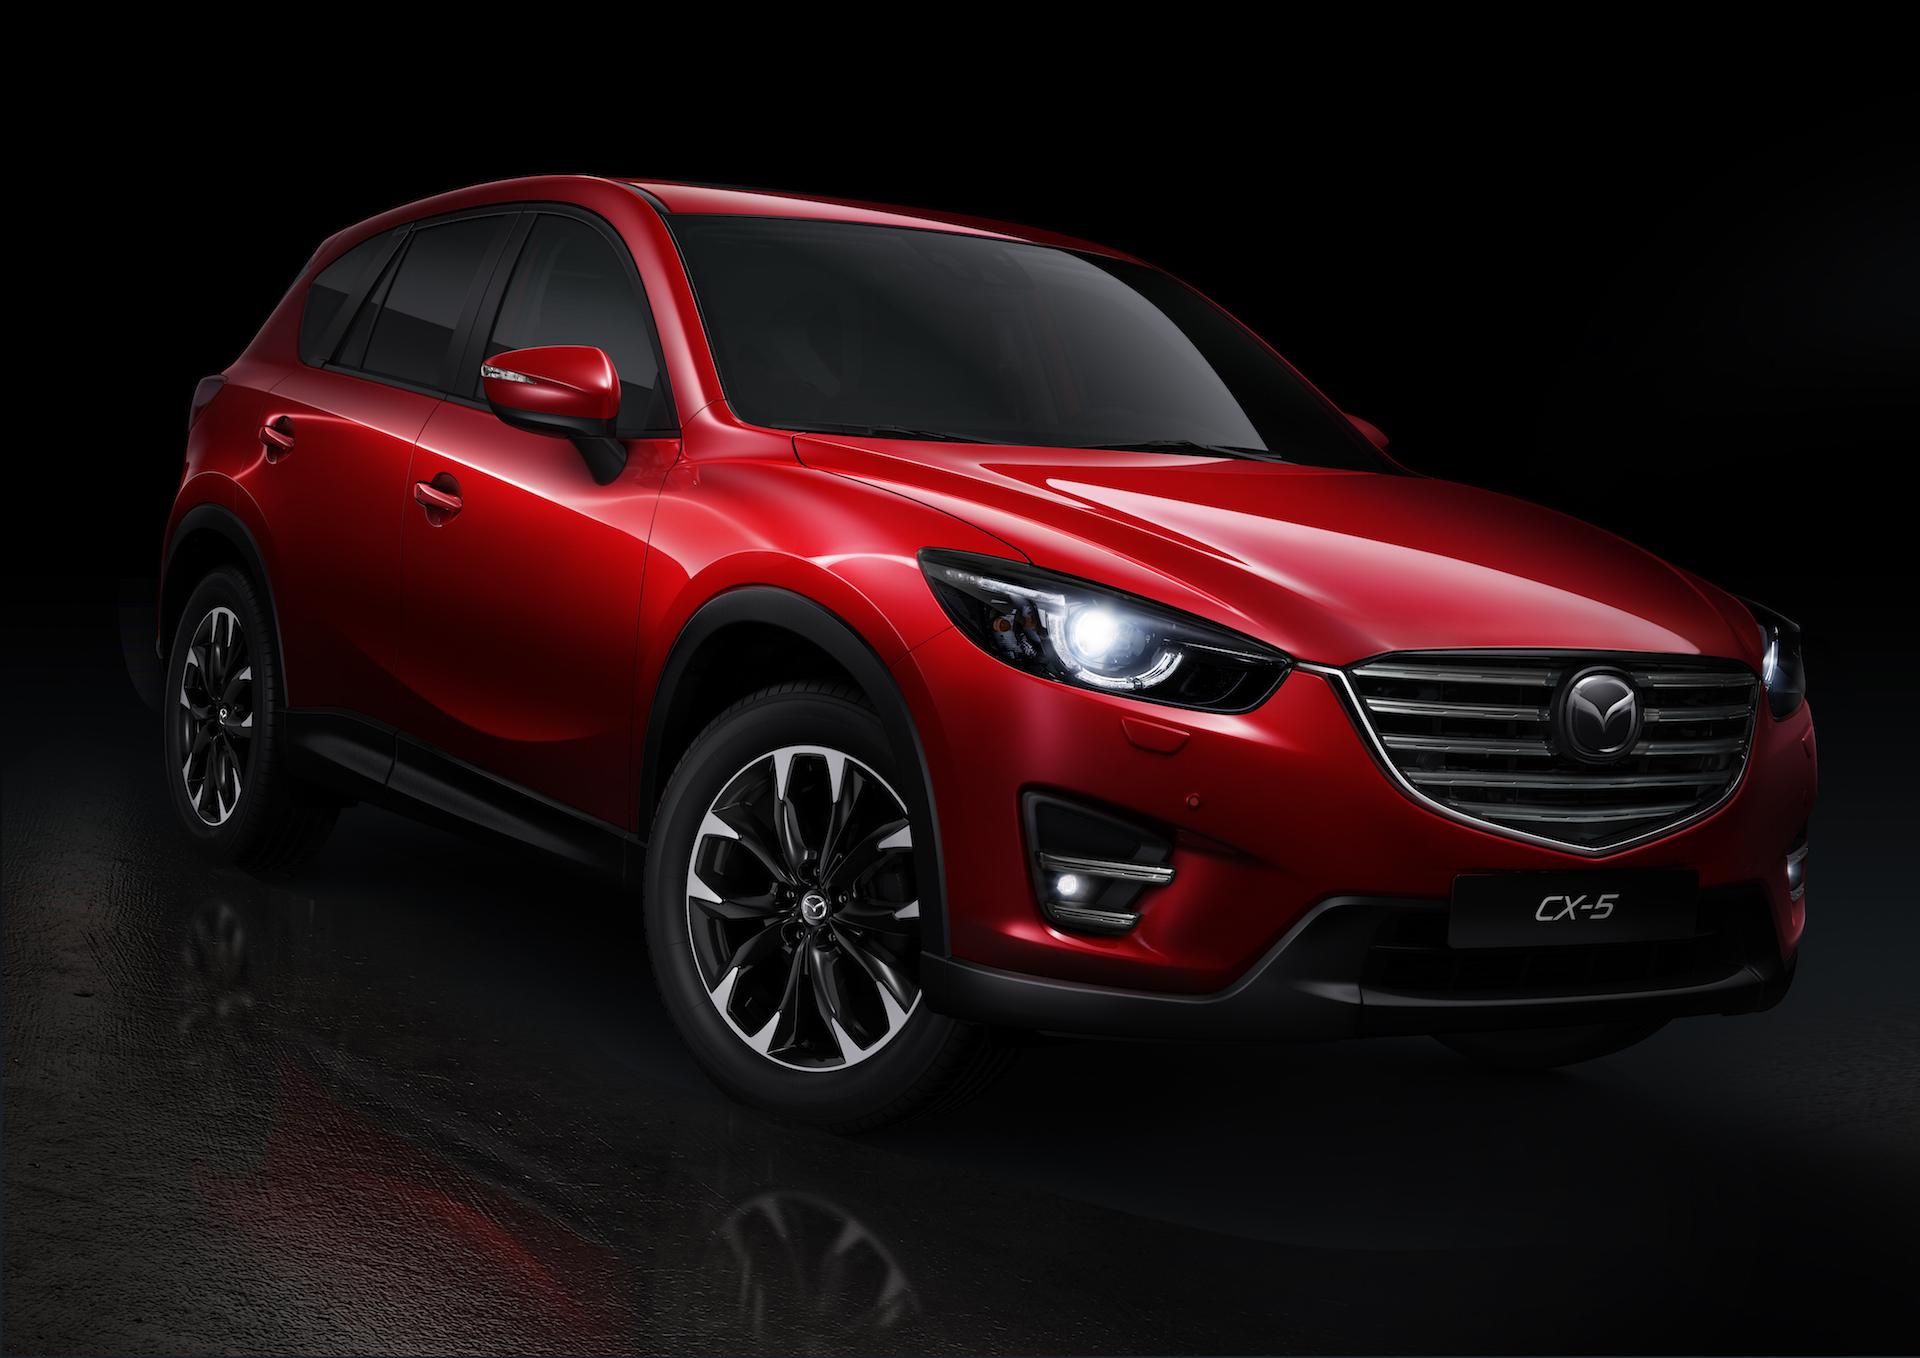 2016 Mazda Cx 5 News